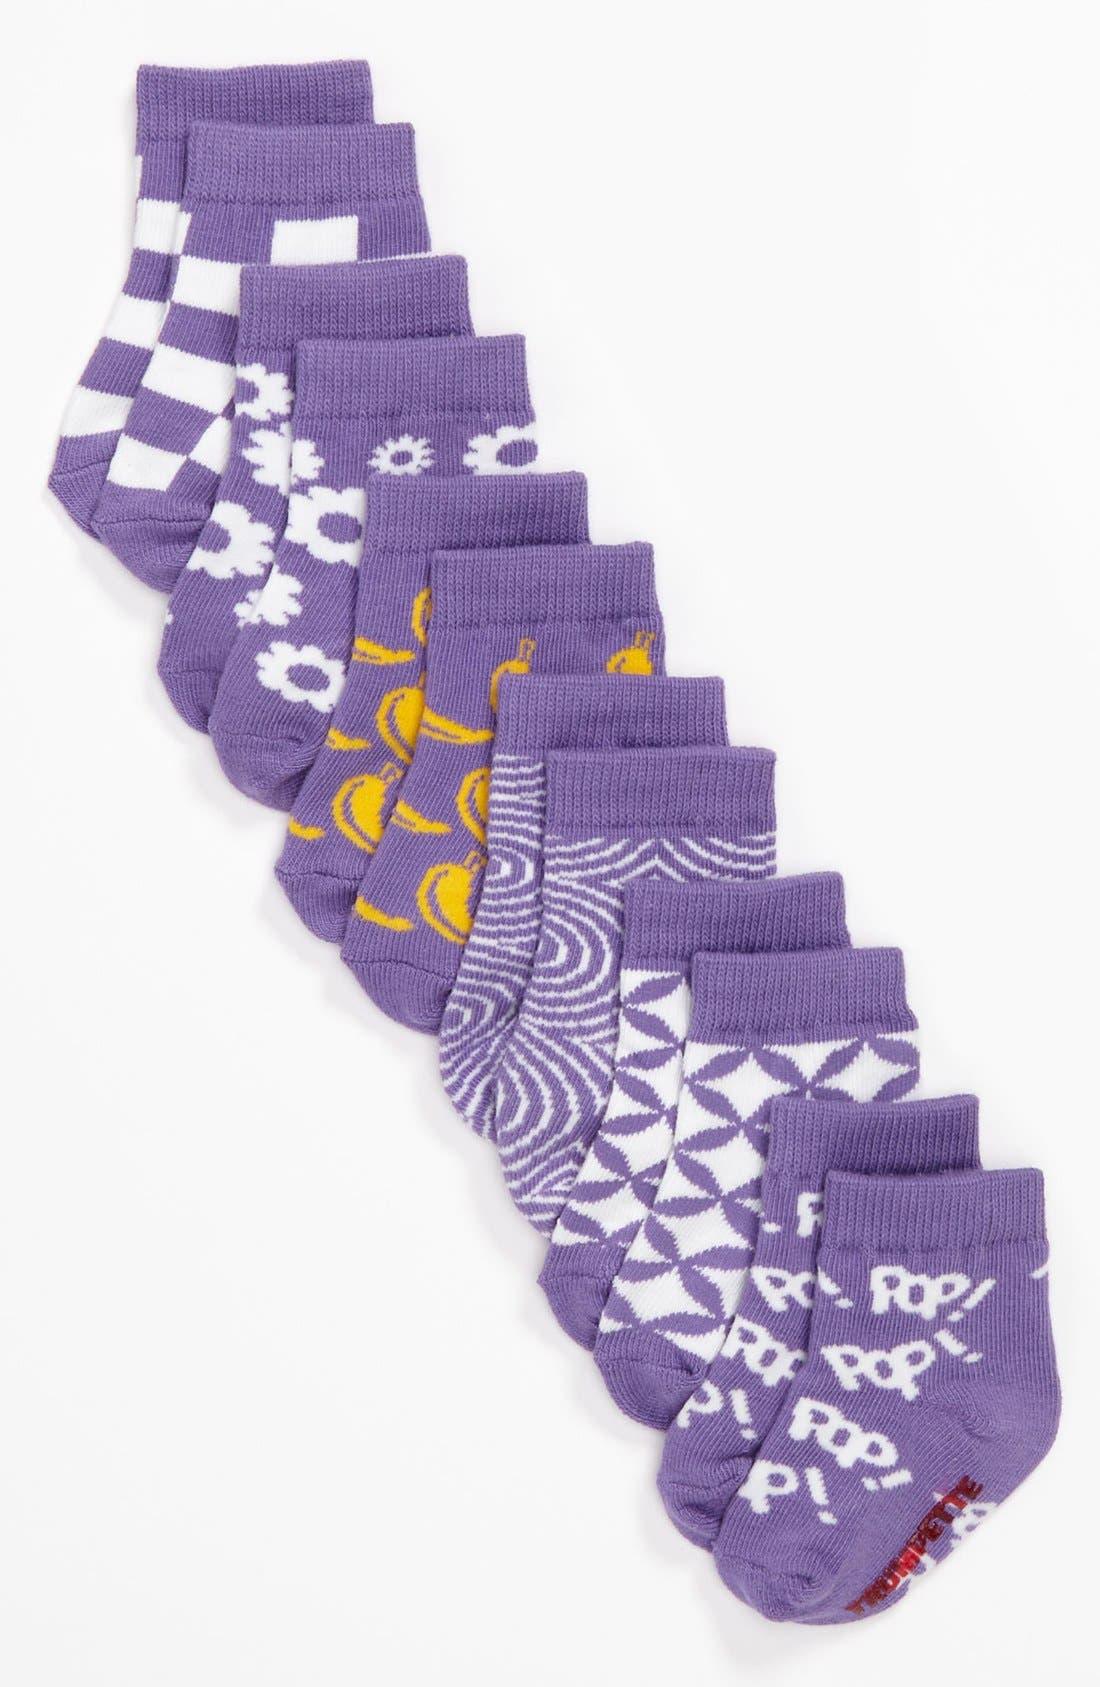 Alternate Image 2  - Trumpette 'Pop Socks in a Tin Can' Sock Set (6-Pack)(Baby Girls)